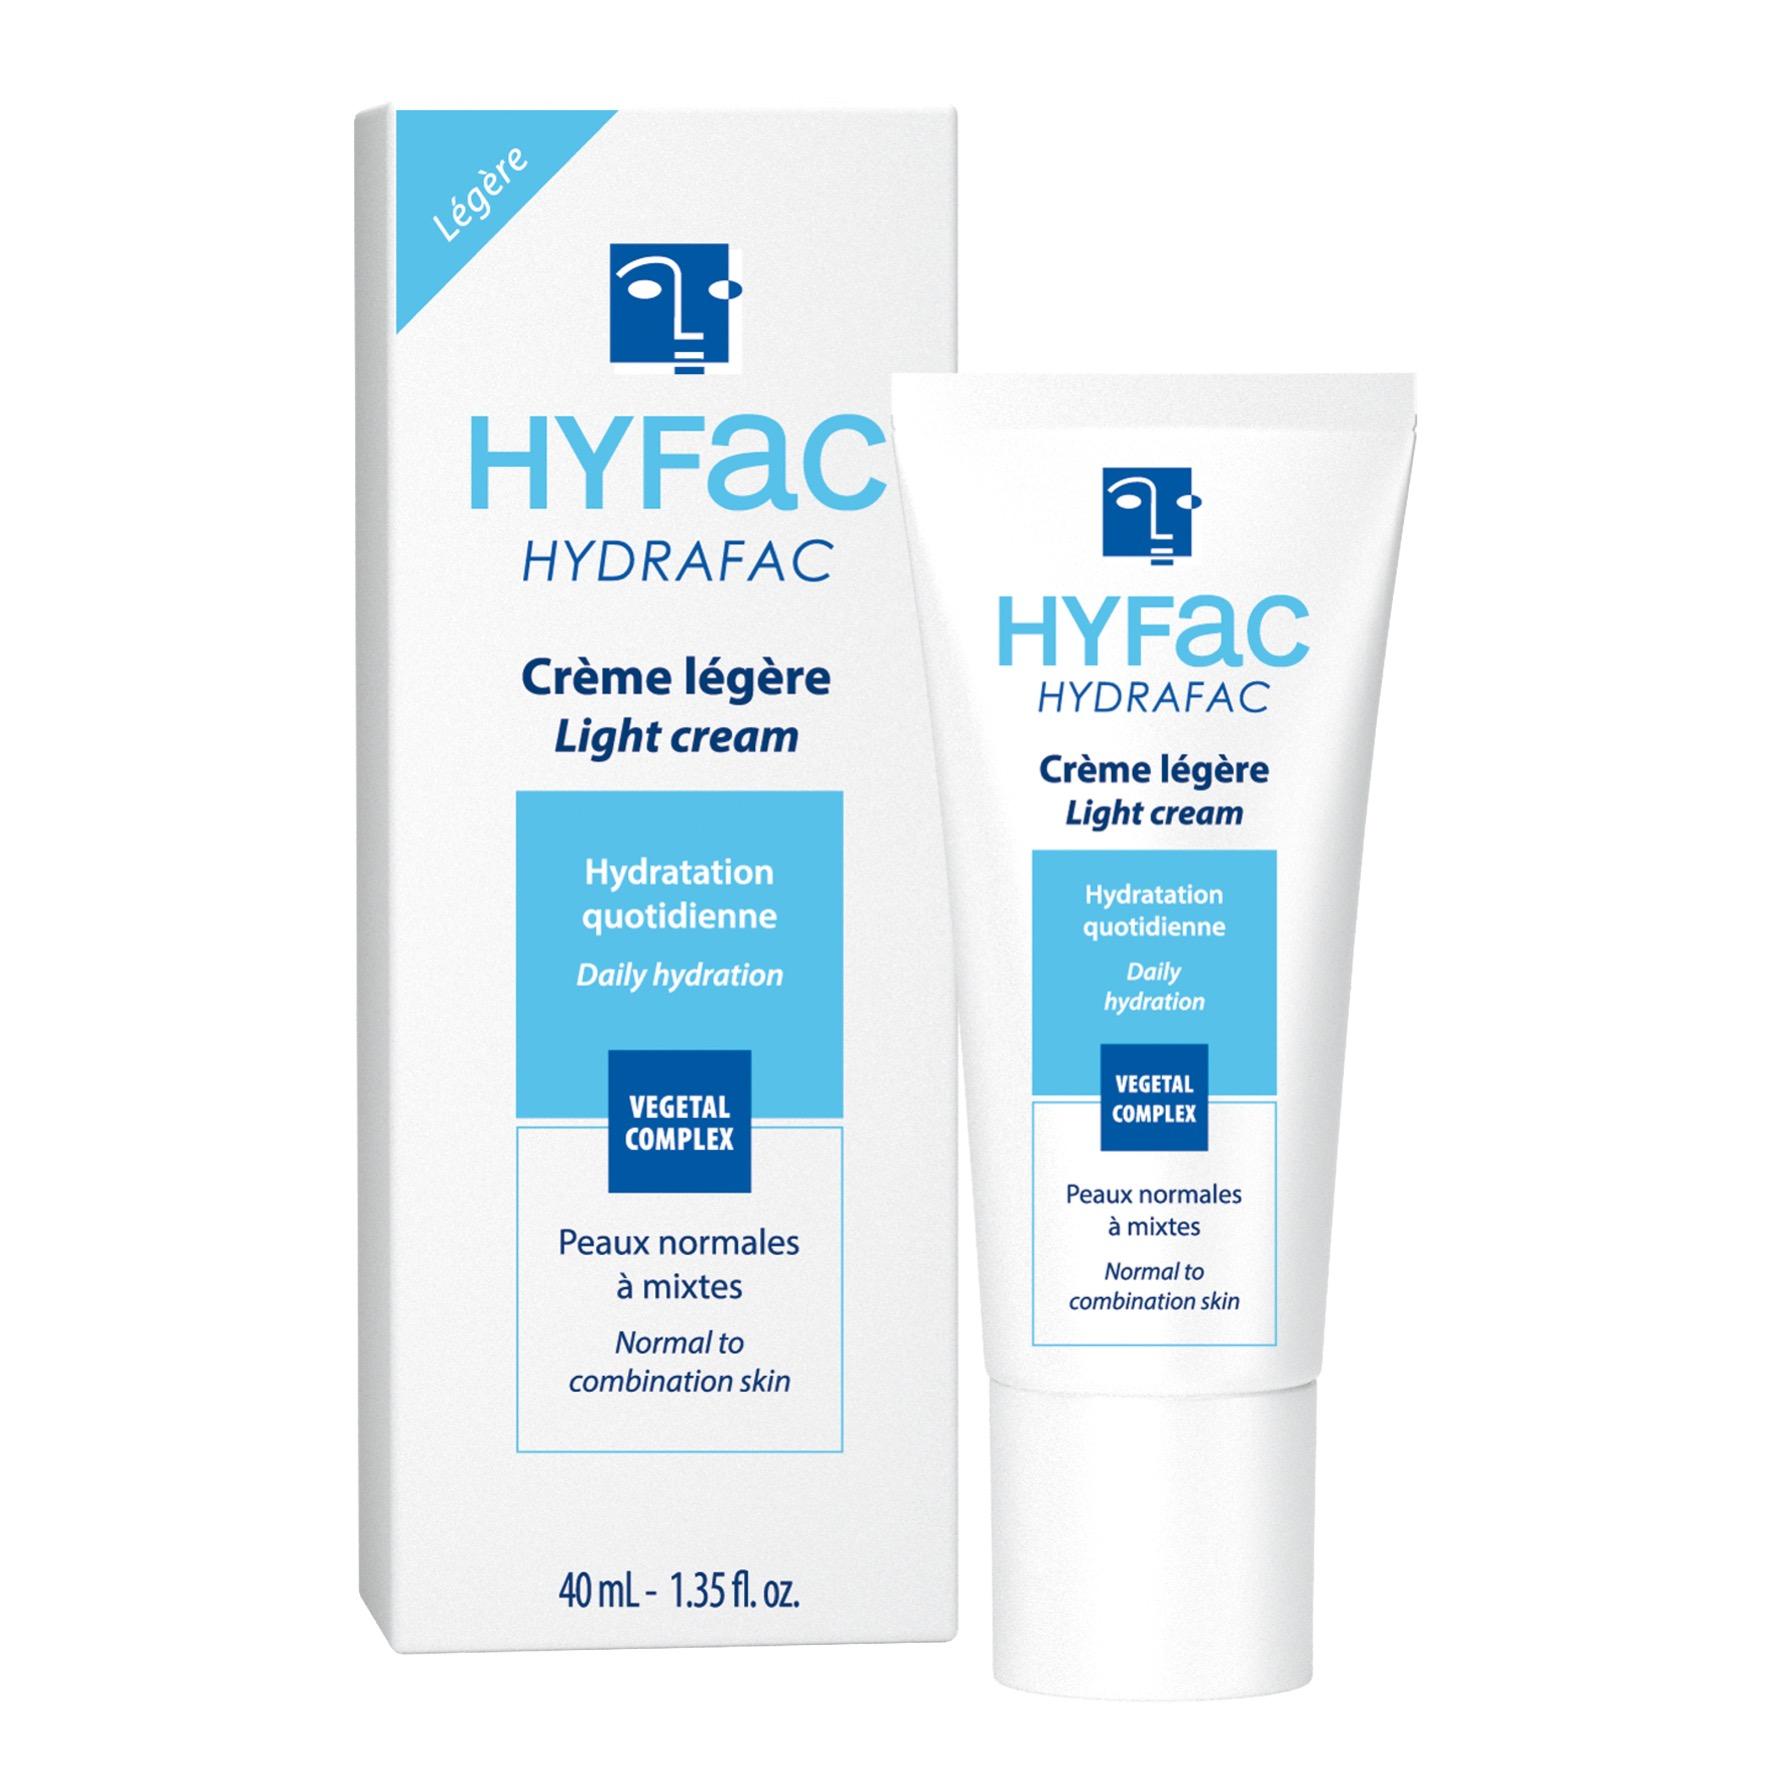 HYDRAFAC light moisturizing cream for normal to combination skin